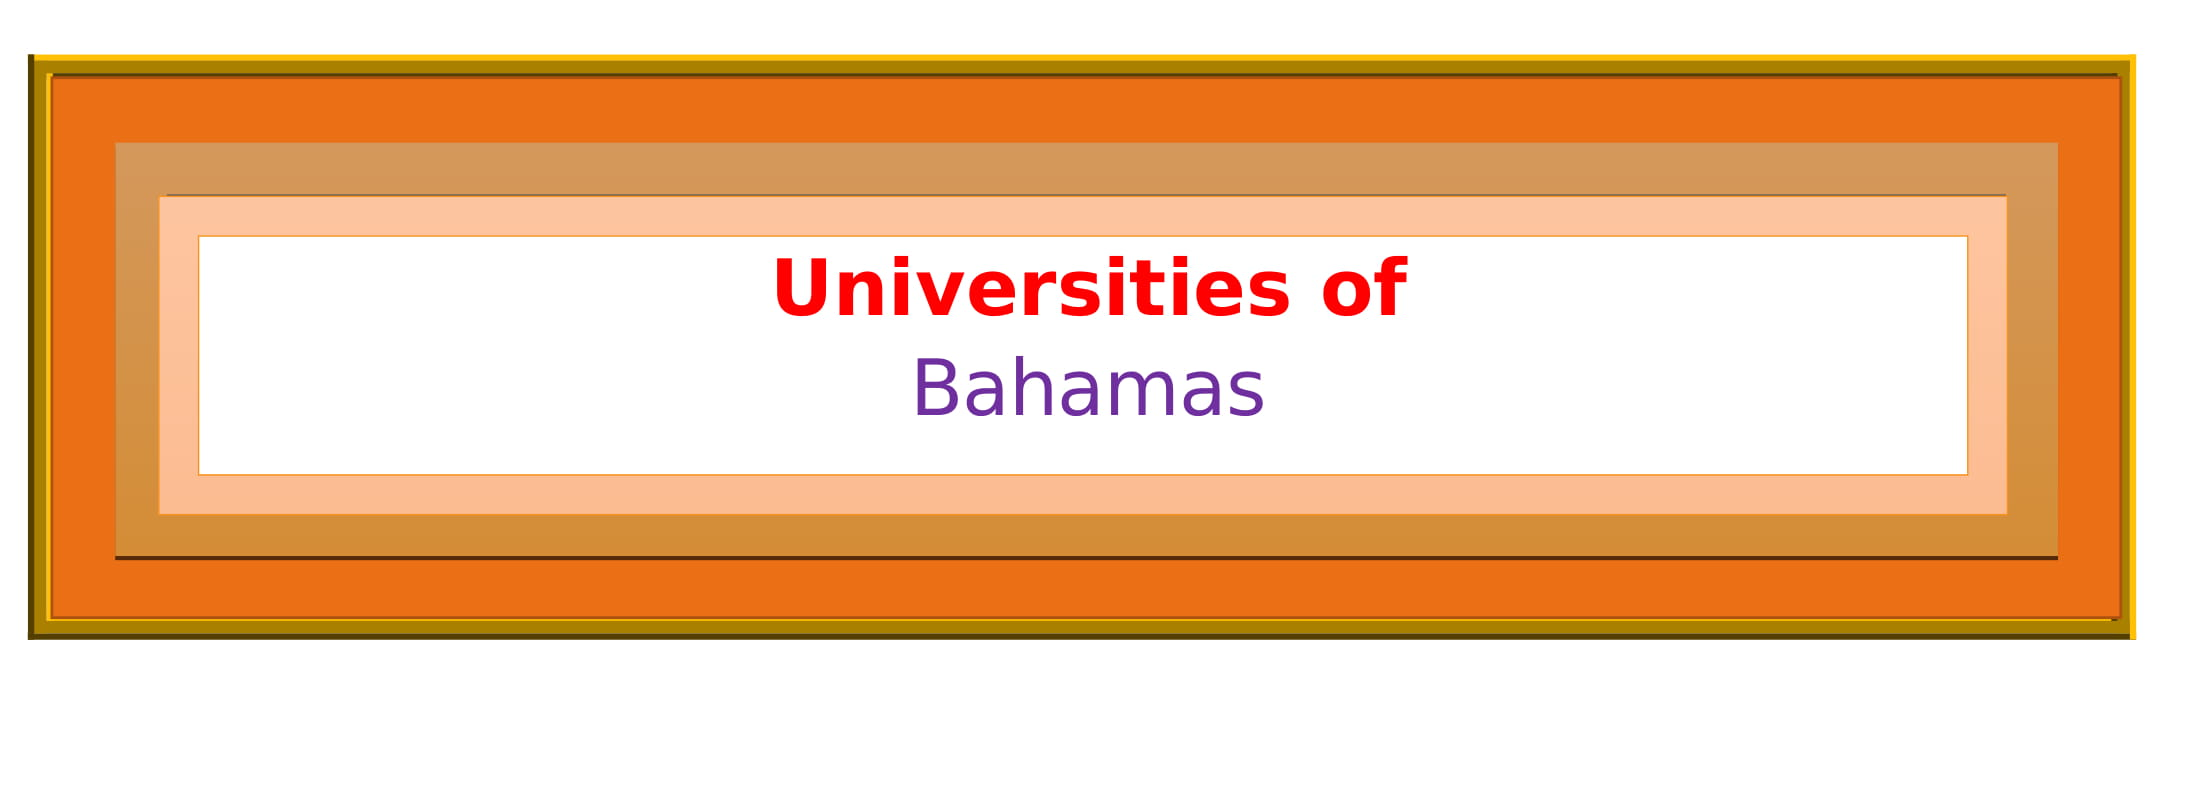 List of Universities in Bahamas